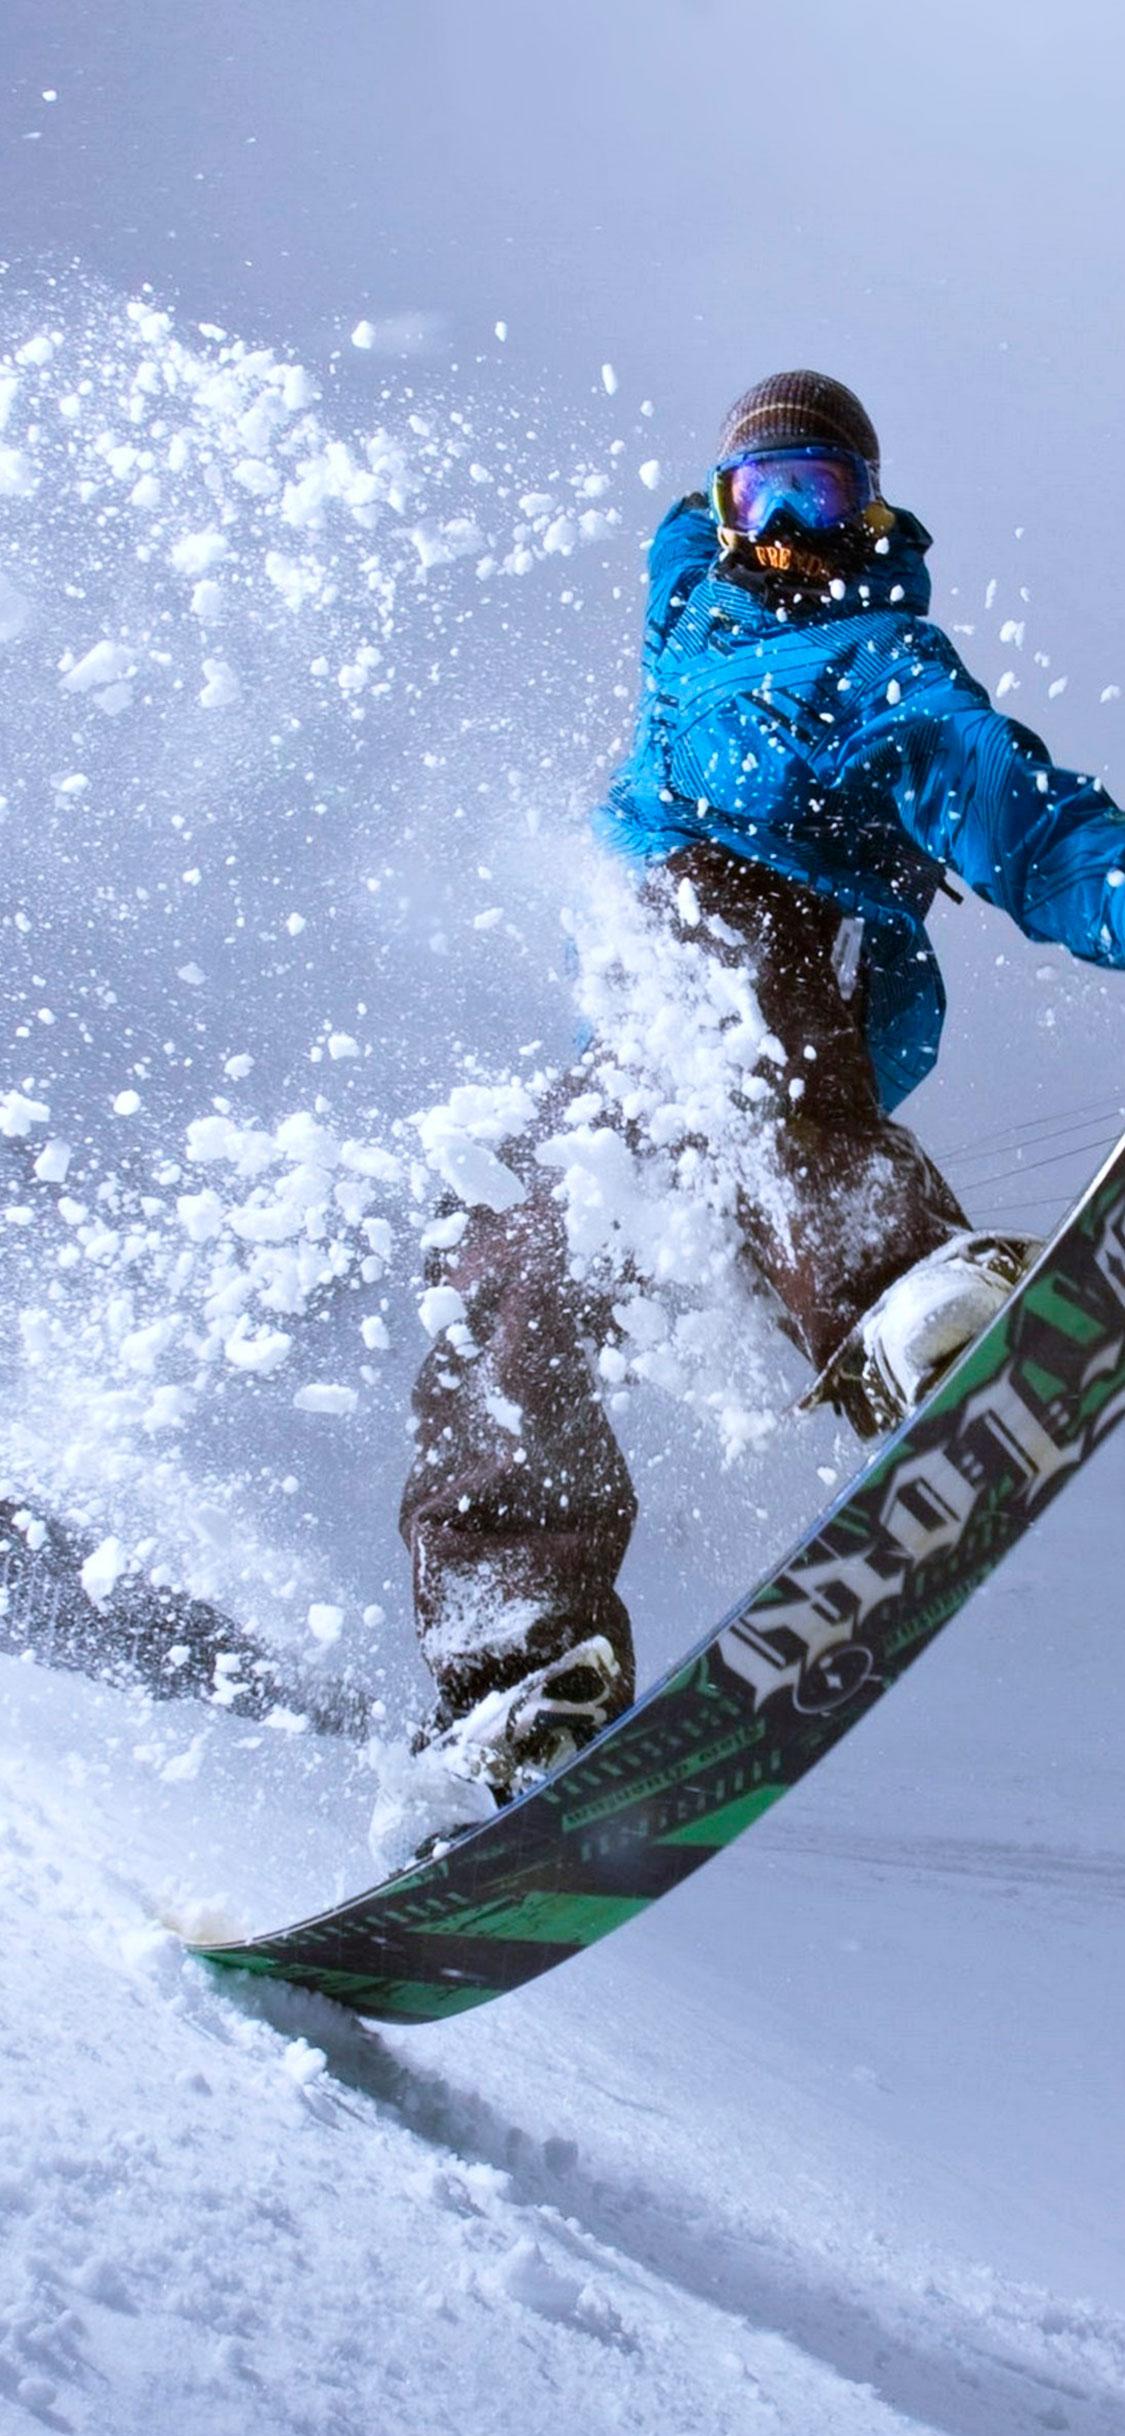 iPhone wallpaper snowboard2 Snowboard